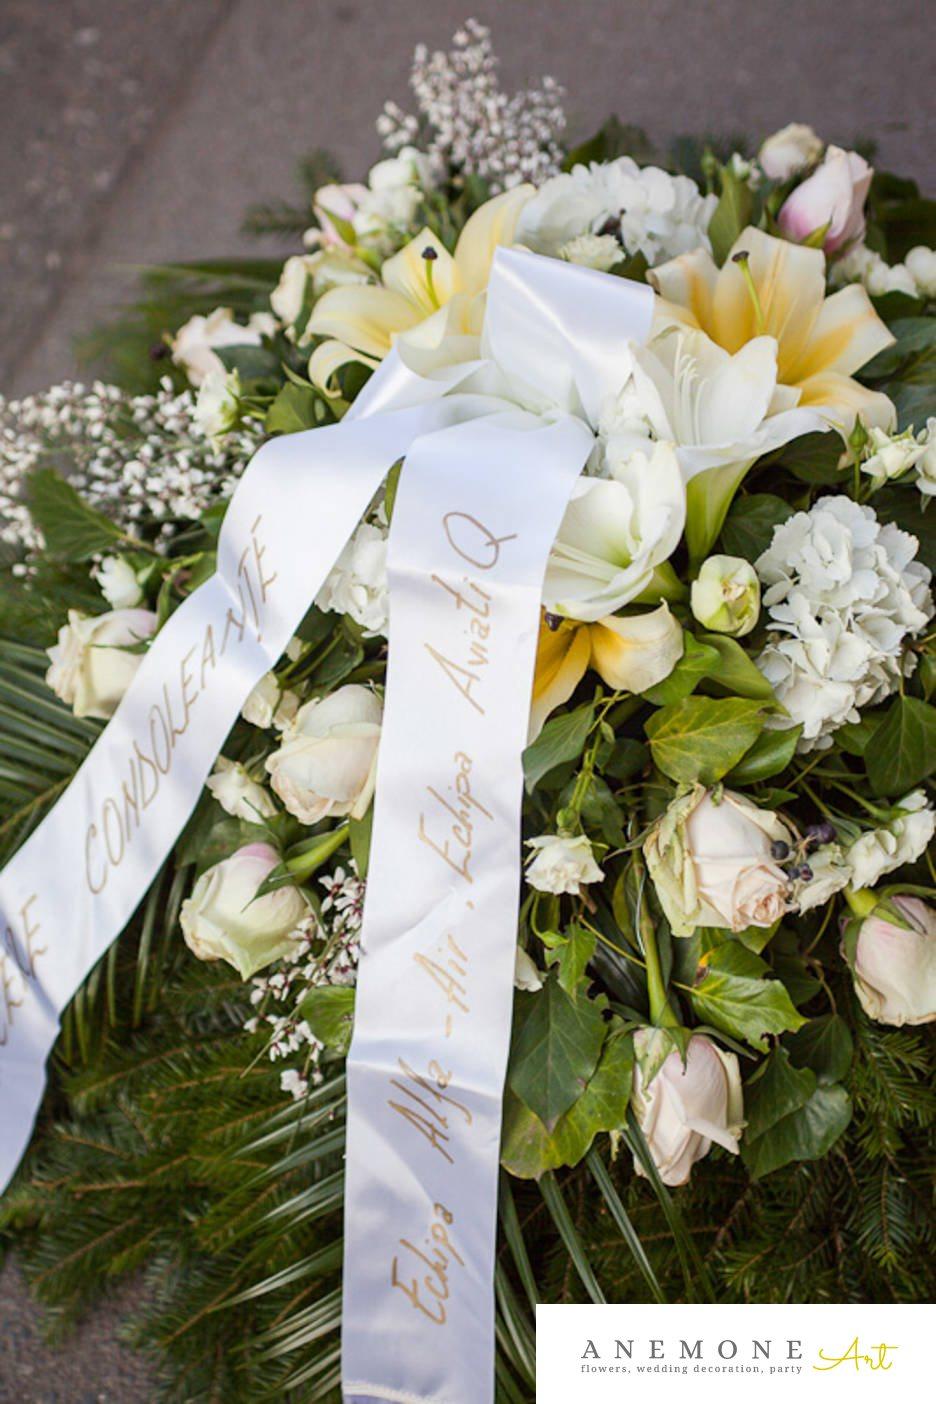 Poza, foto cu Flori de nunta alb, coroana funerara, crin, hortensia, trandafiri in Arad, Timisoara, Oradea (wedding flowers, bouquets) nunta Arad, Timisoara, Oradea